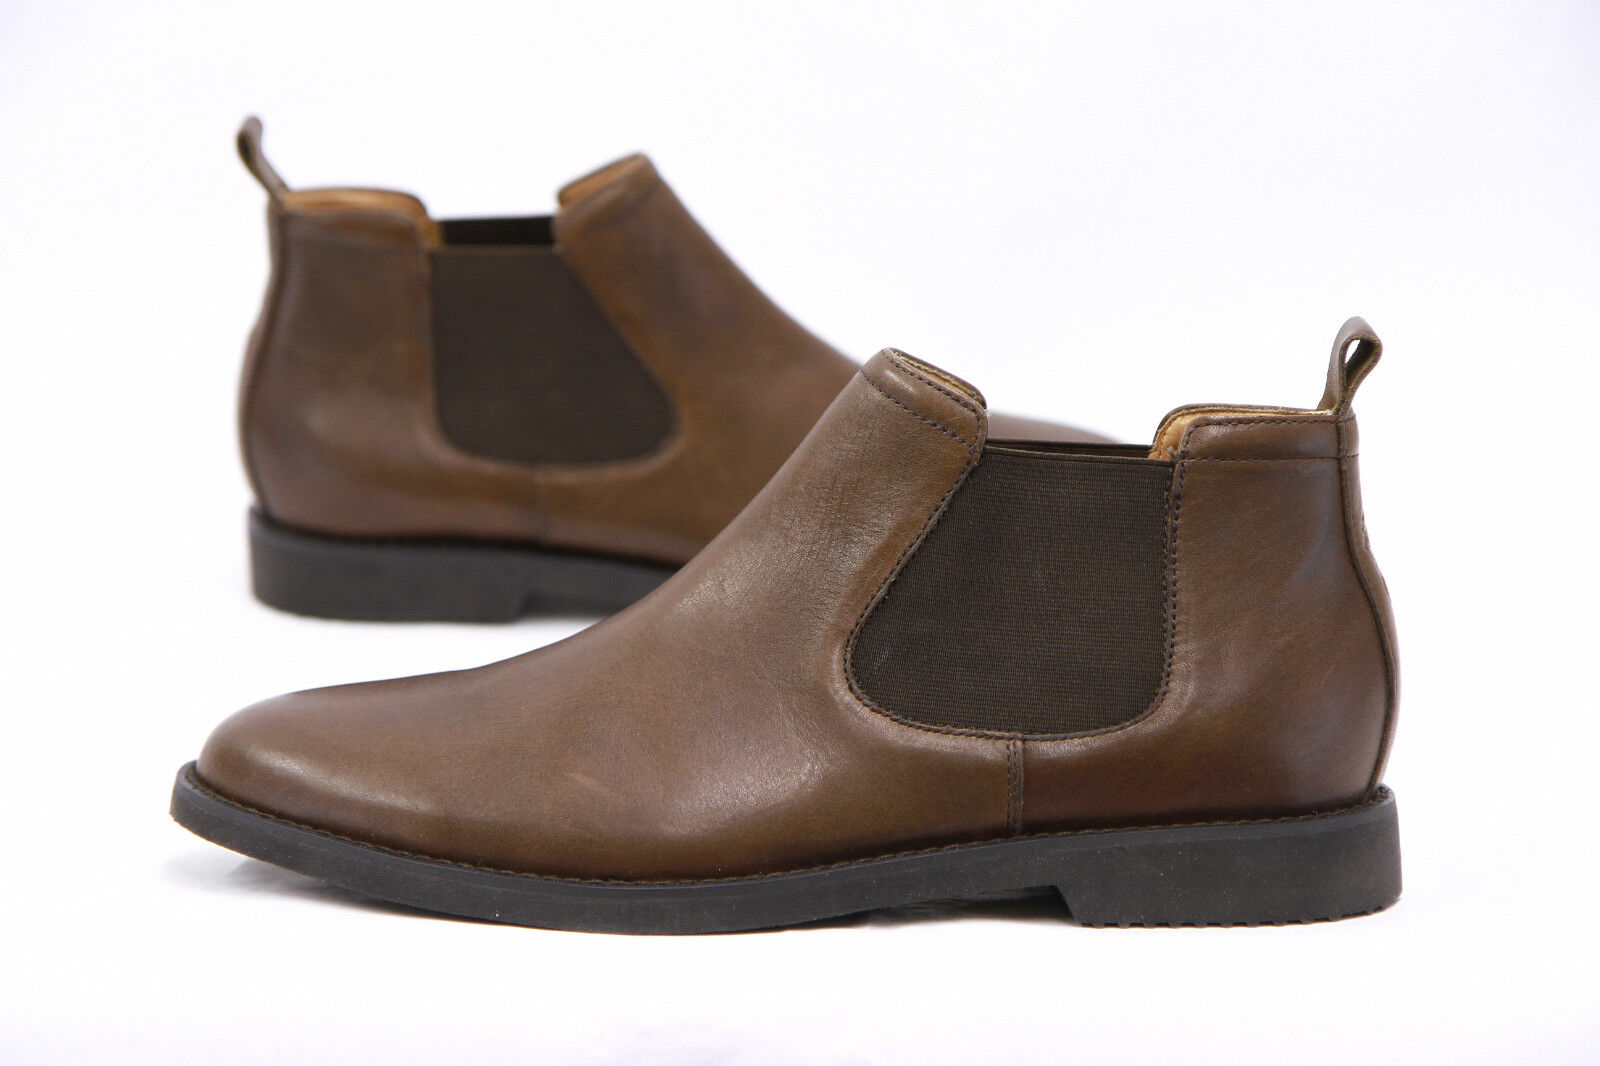 .NWOB Ralph Lauren Polo Uomo 100%Pelle Brown Waterbury Chelsea Stivali Sz 14D